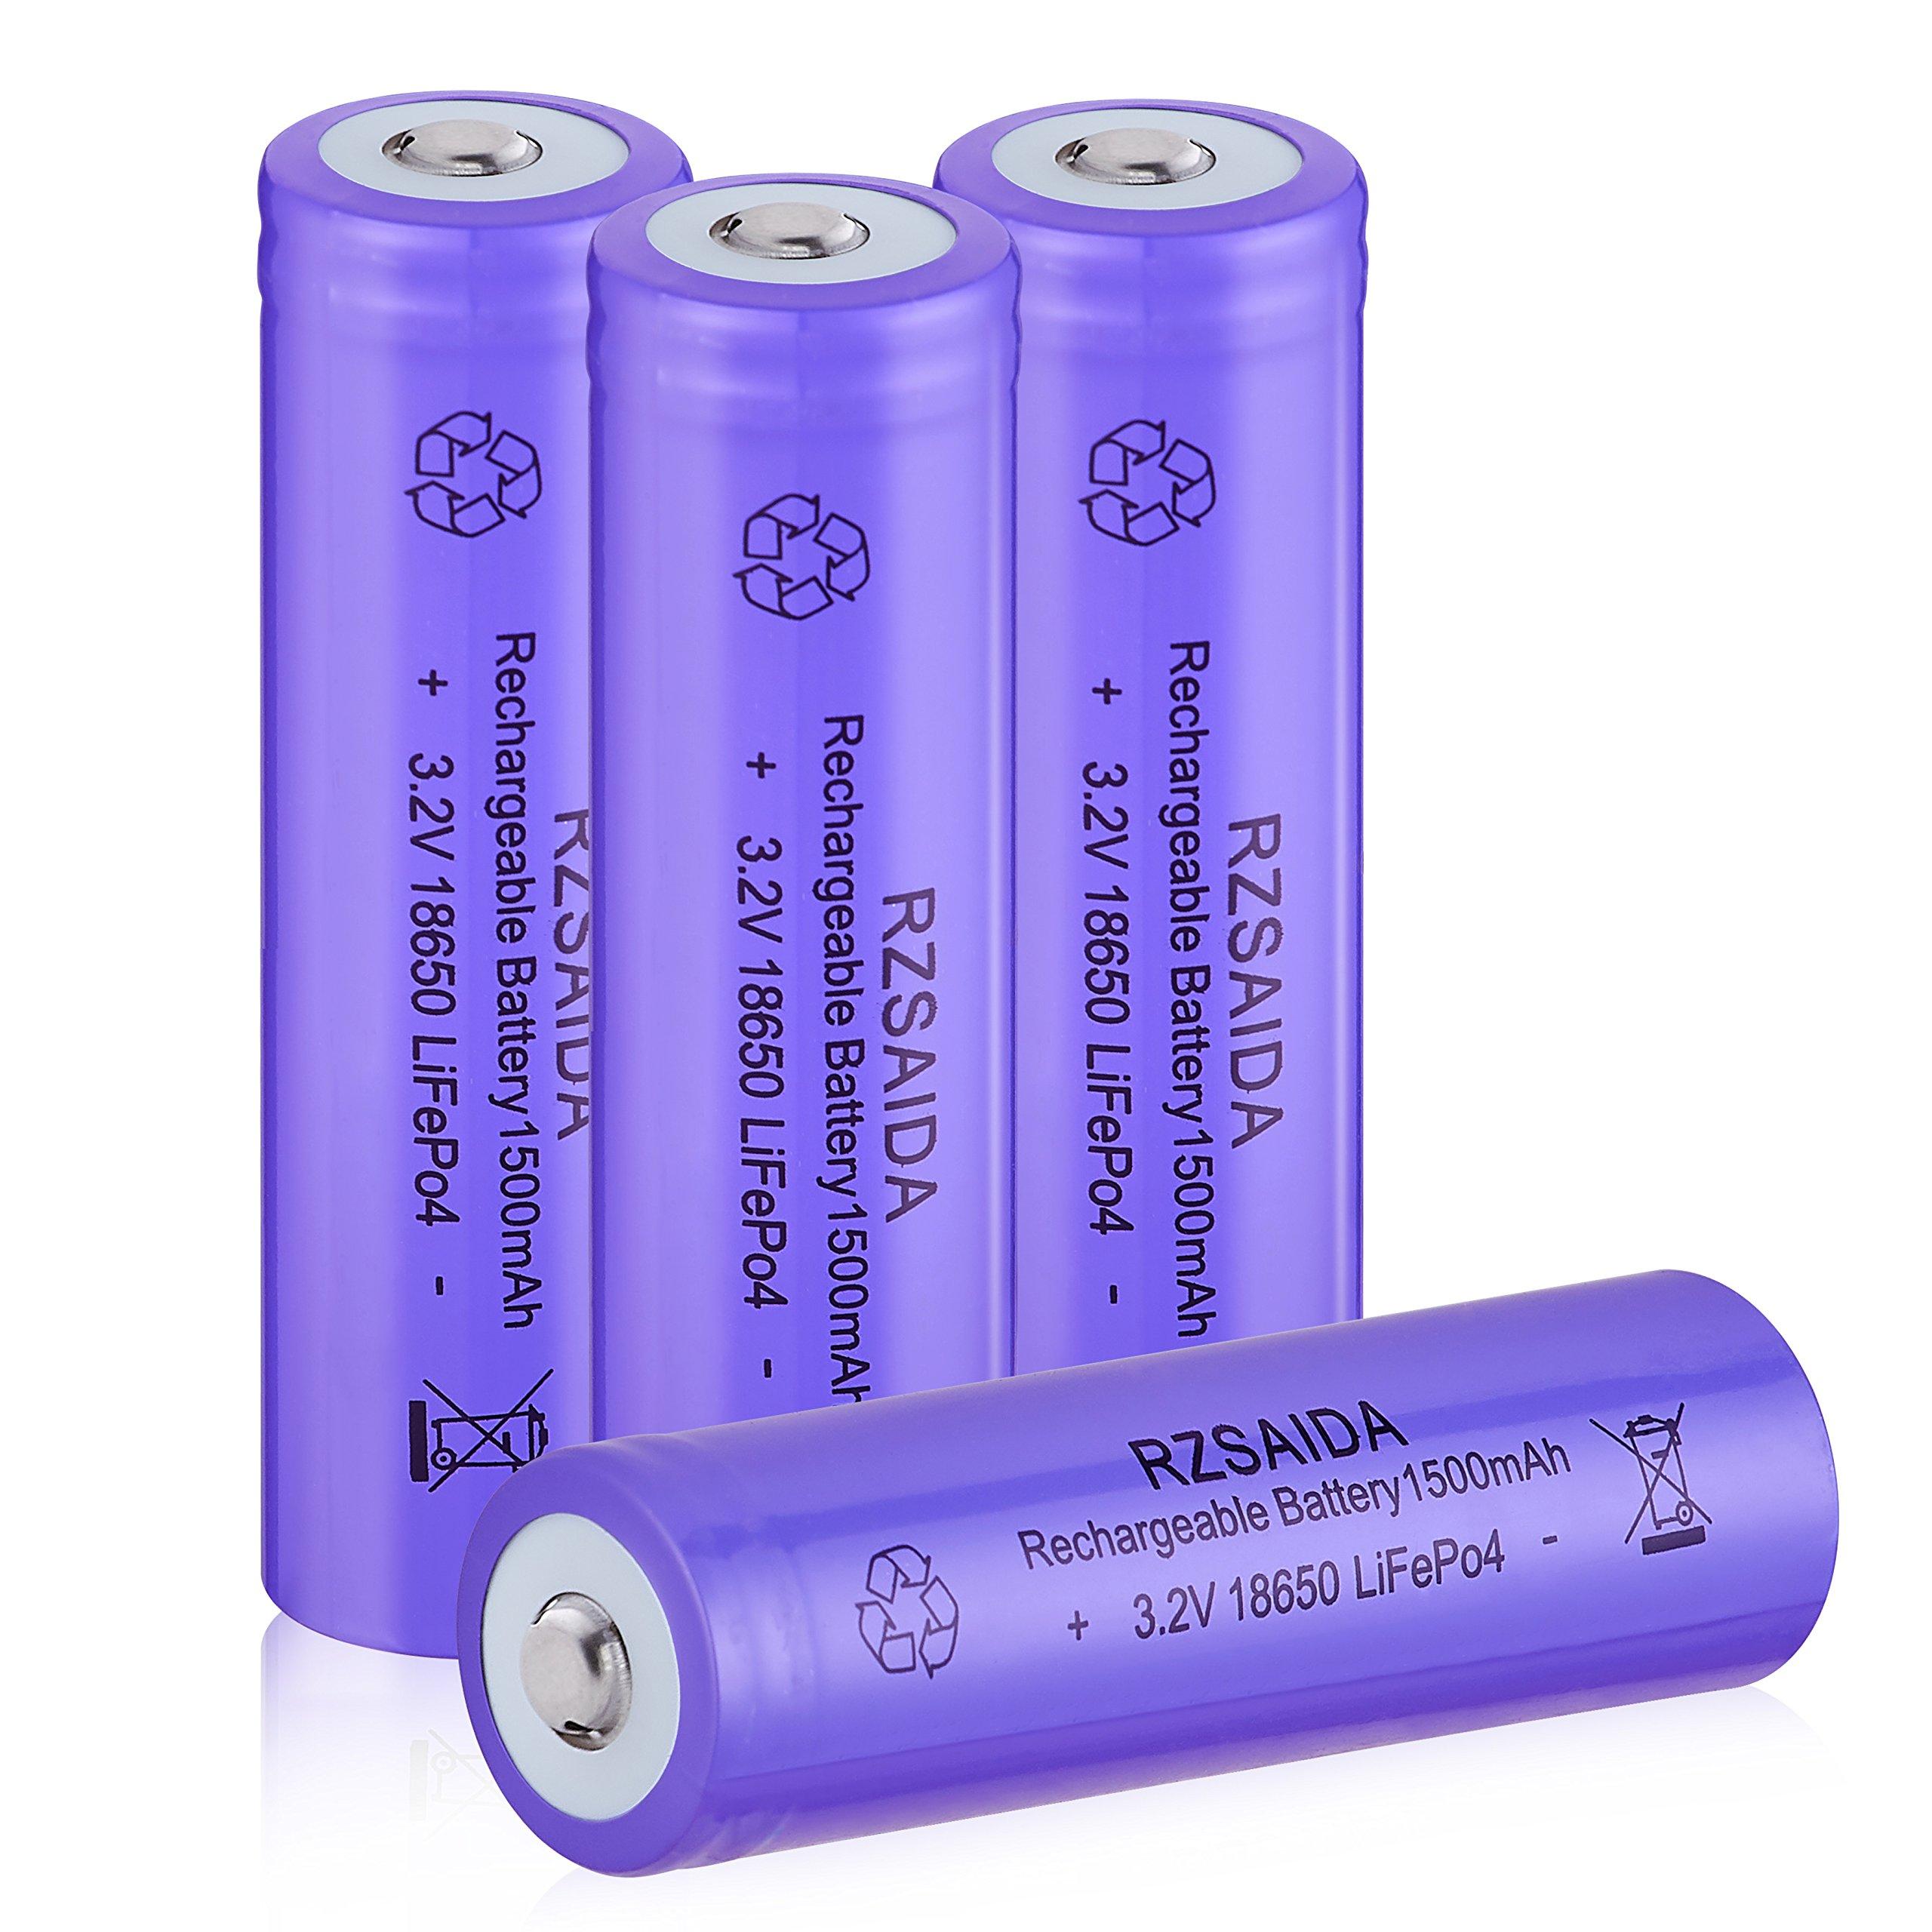 Rechargeable Battery Button Top LiFePO4-RZSAIDA 3.2V 6000mAh IFR18650 Battery for Garden Lamps Solar Lights 4PCS 1500mAh